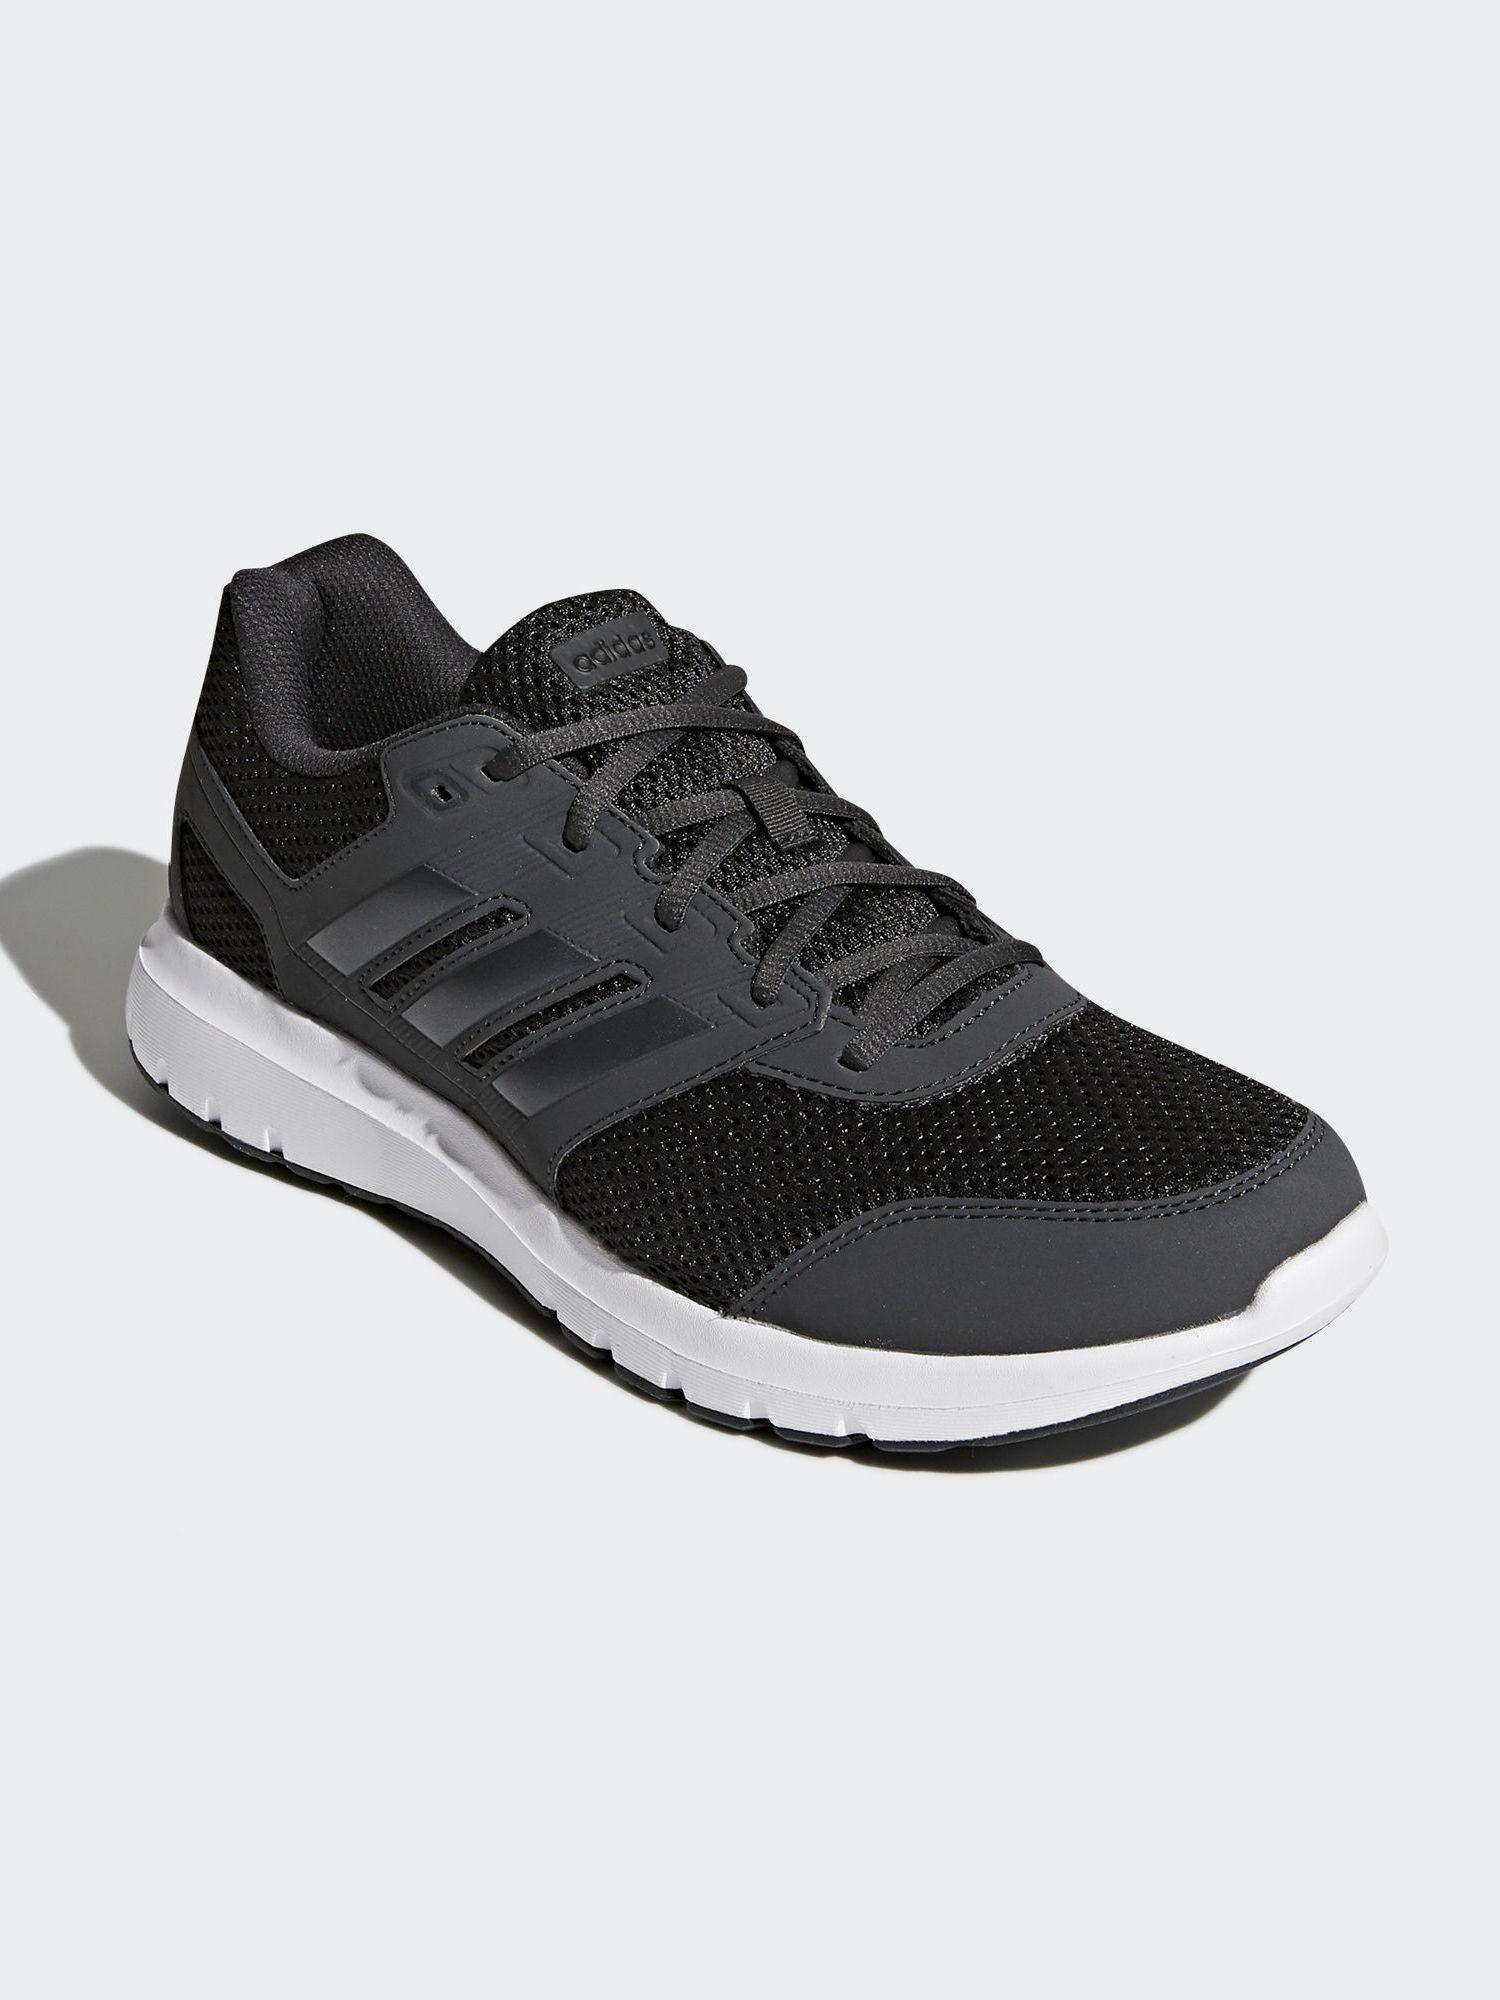 Running Da Scarpe Trail Adidas Lite Utjck13fl Duramo 2 Uomo 0 Cg4048 nON0Pk8Xw